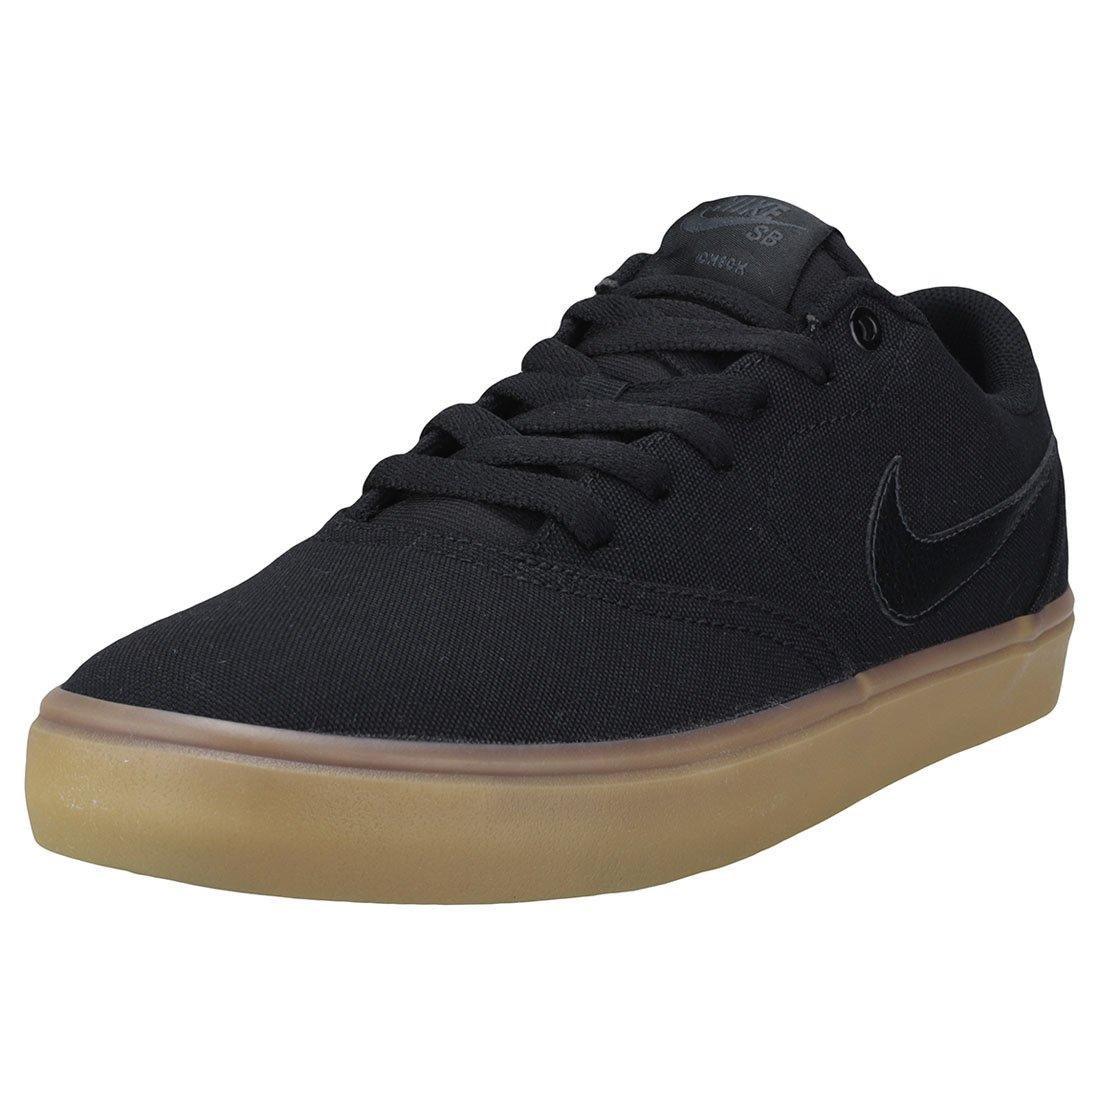 Nike Men's SB Check Solarsoft Canvas Skateboarding Shoes 8 D US|Black/Black-gum Light Brown